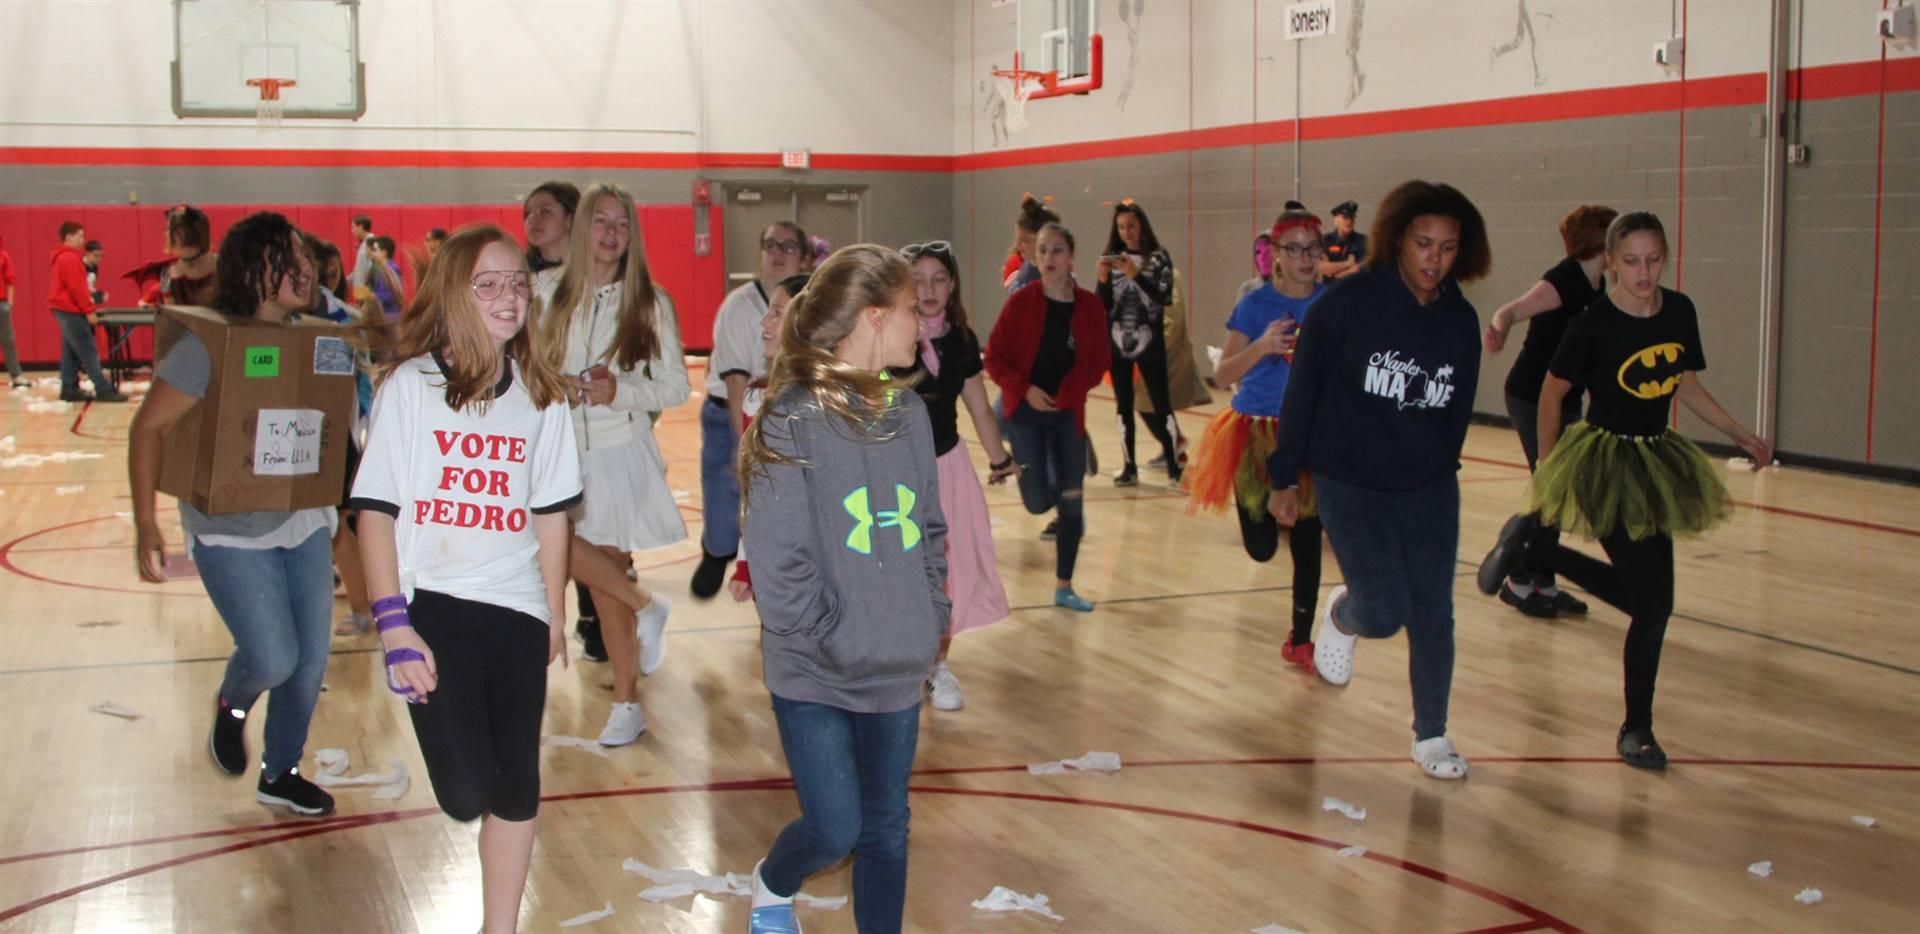 students dancing in gymnasium